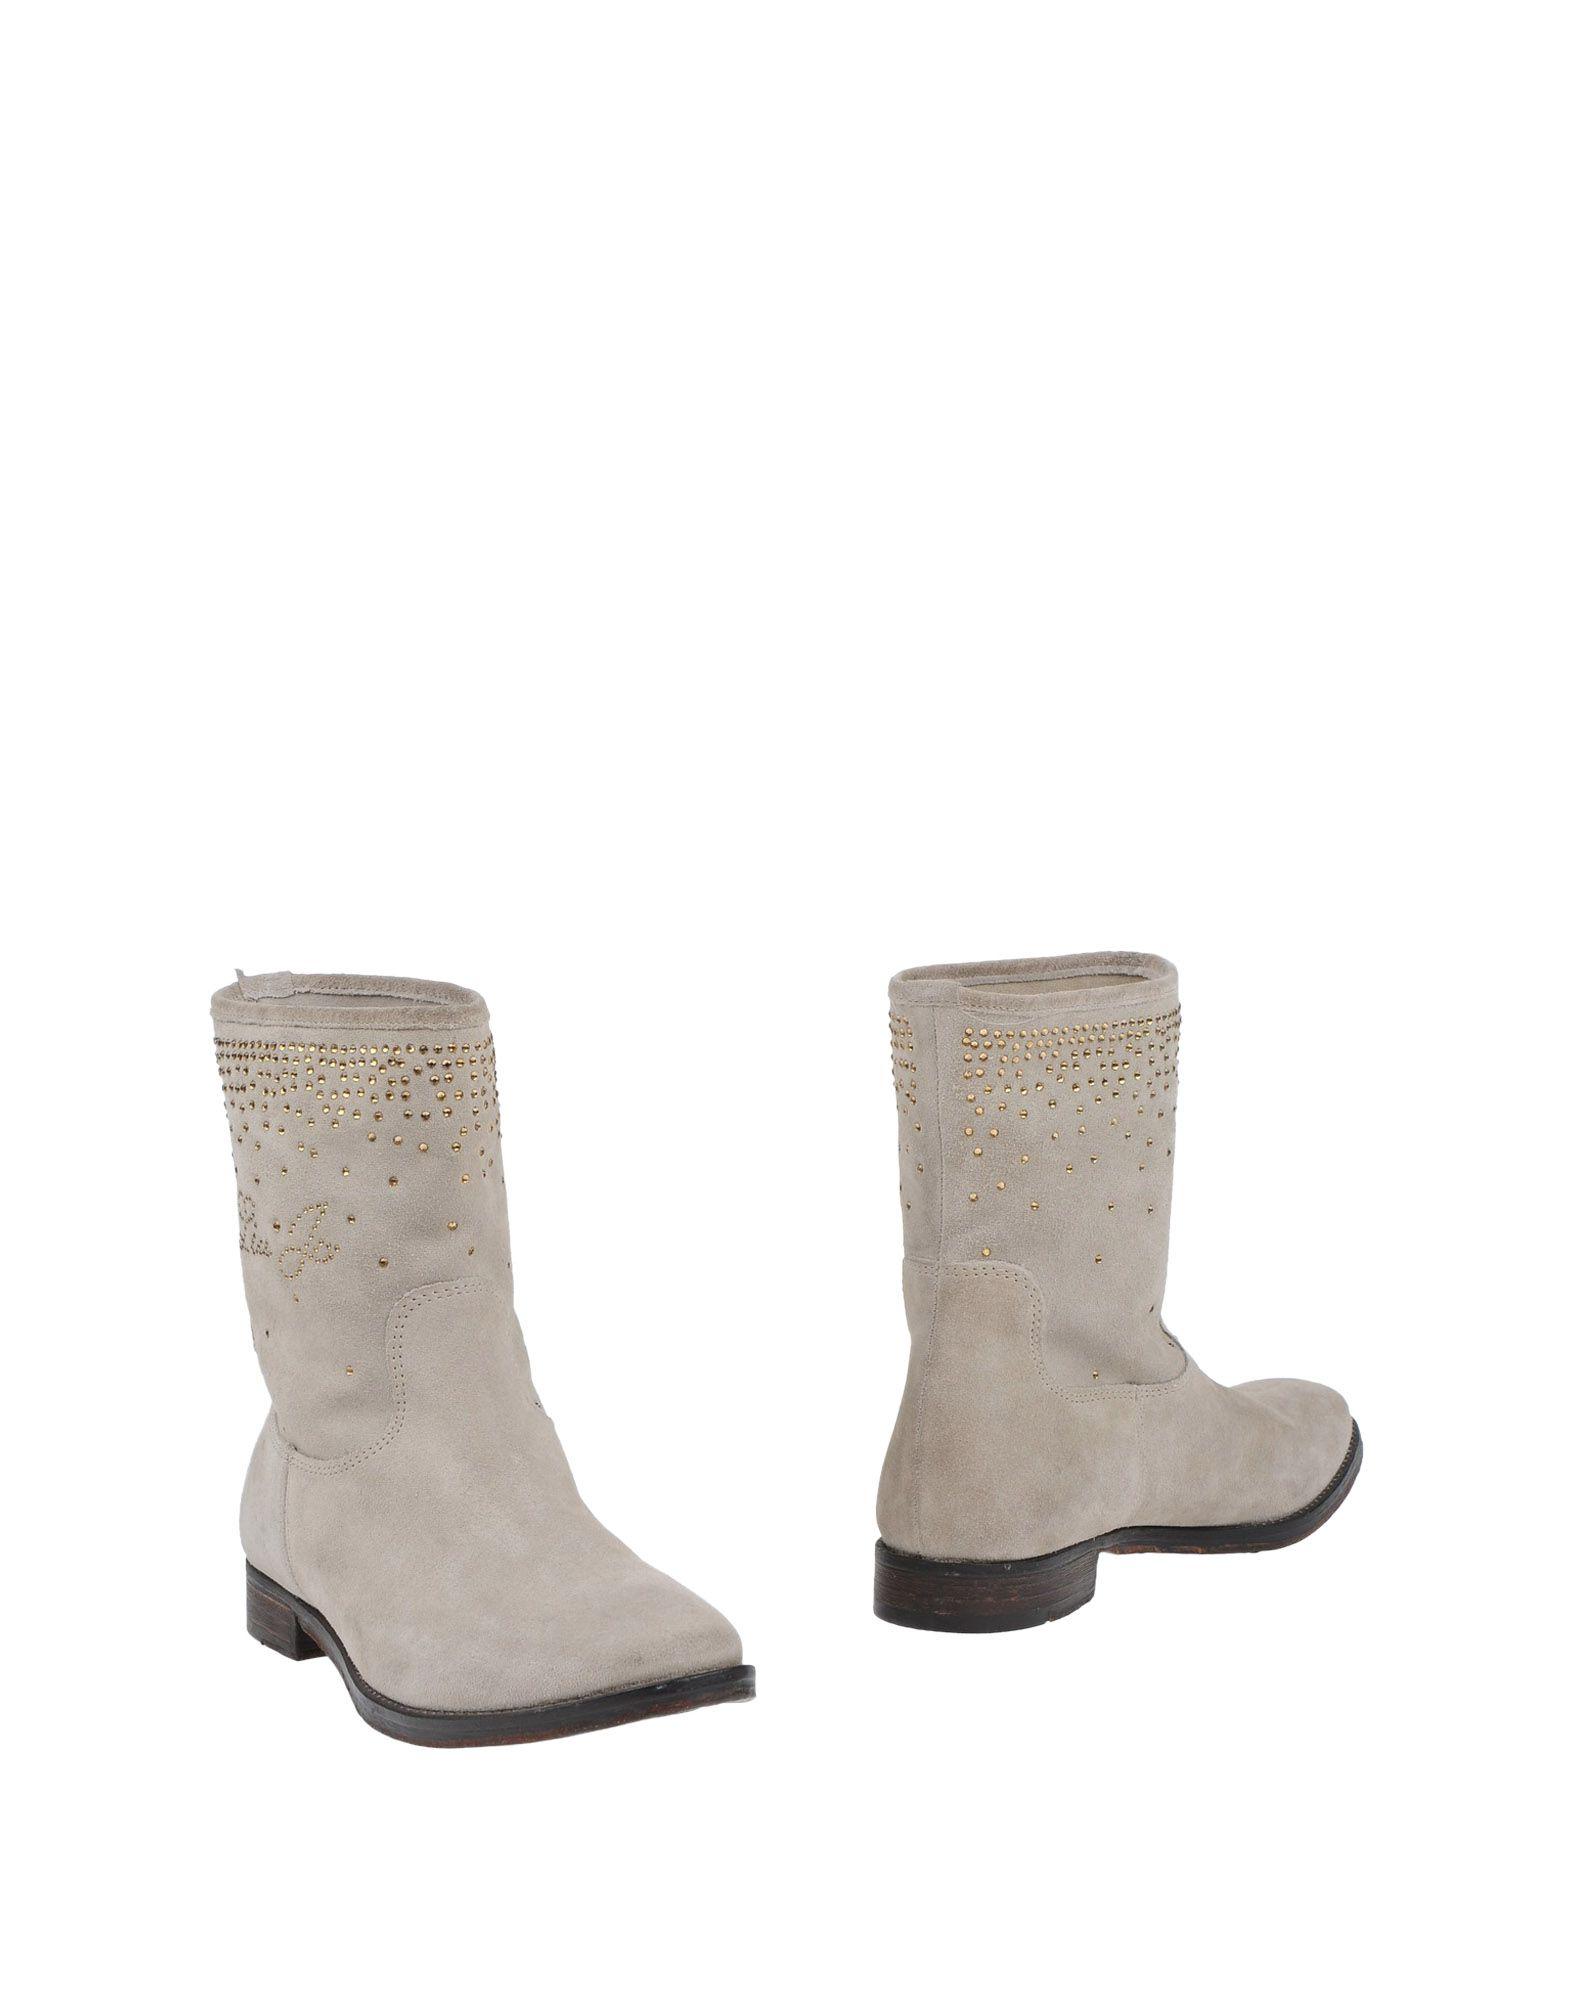 Liu •Jo Shoes Stiefelette Damen  11329299QI Gute Qualität beliebte Schuhe